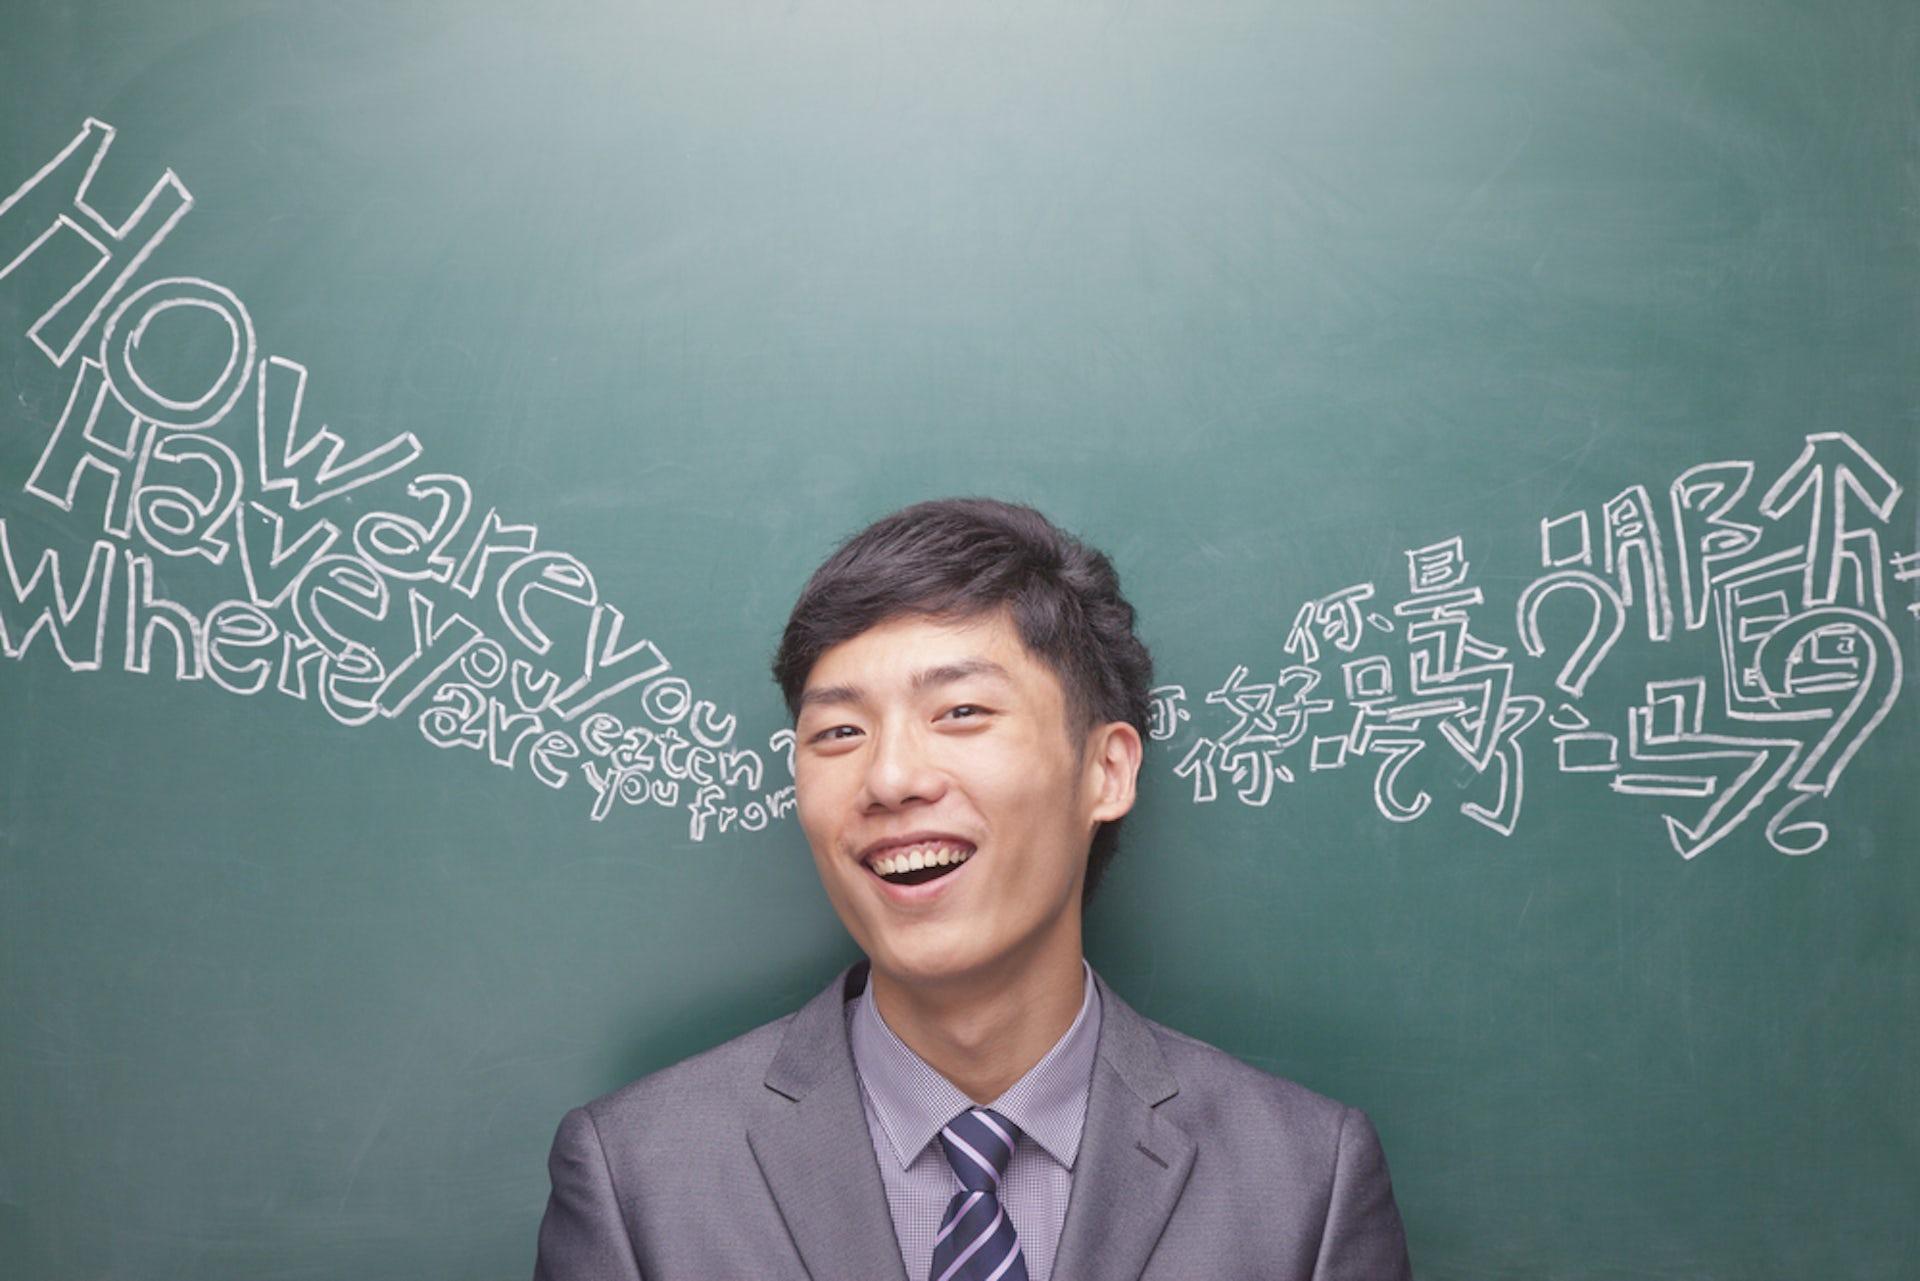 If you speak Mandarin, your brain is different